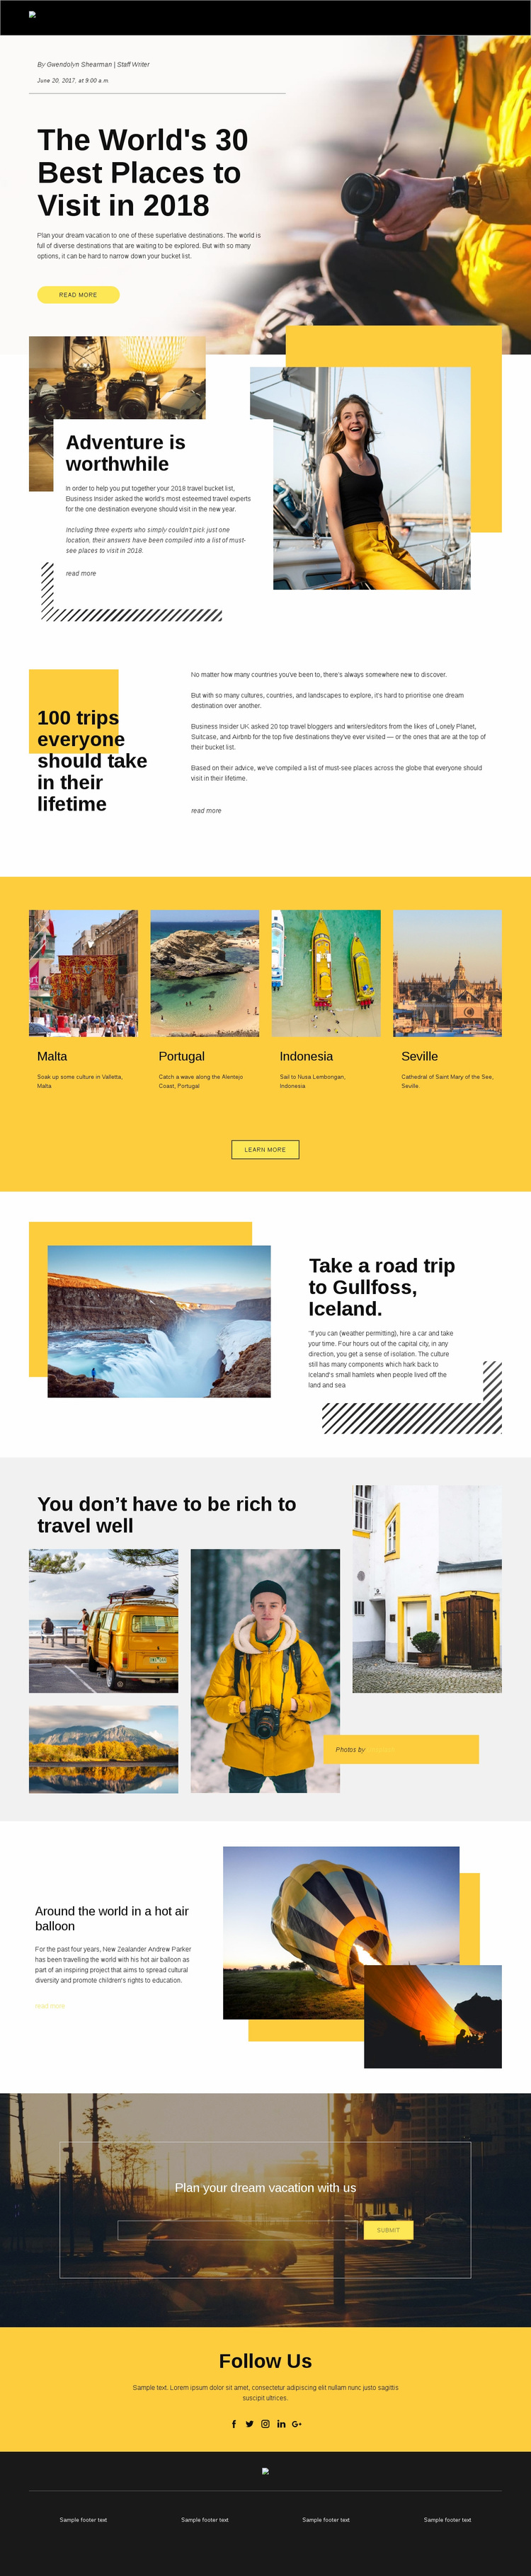 Best Places to Visit Web Page Designer